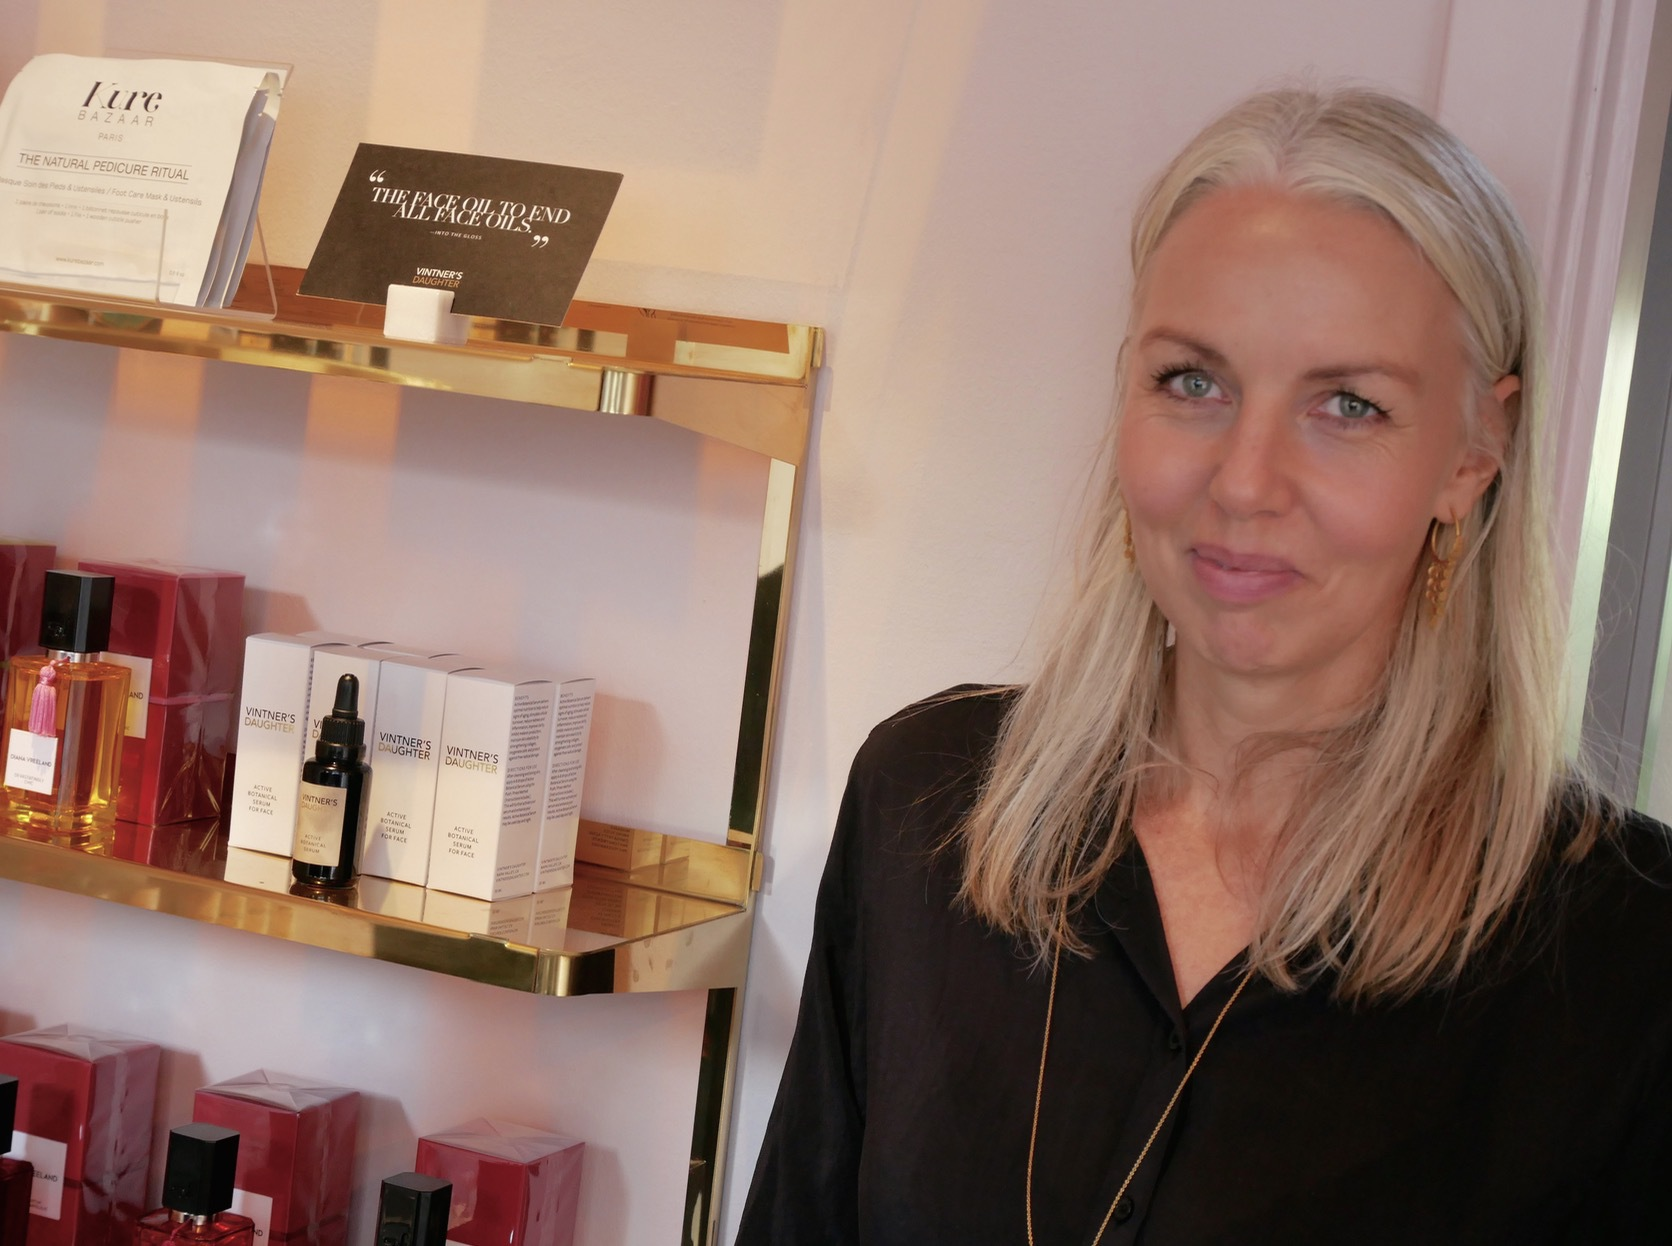 Danska ELLE:s skönhetsredaktöre Charlotte Torpegaard har samlat sina favoriter i en egen liten butik.